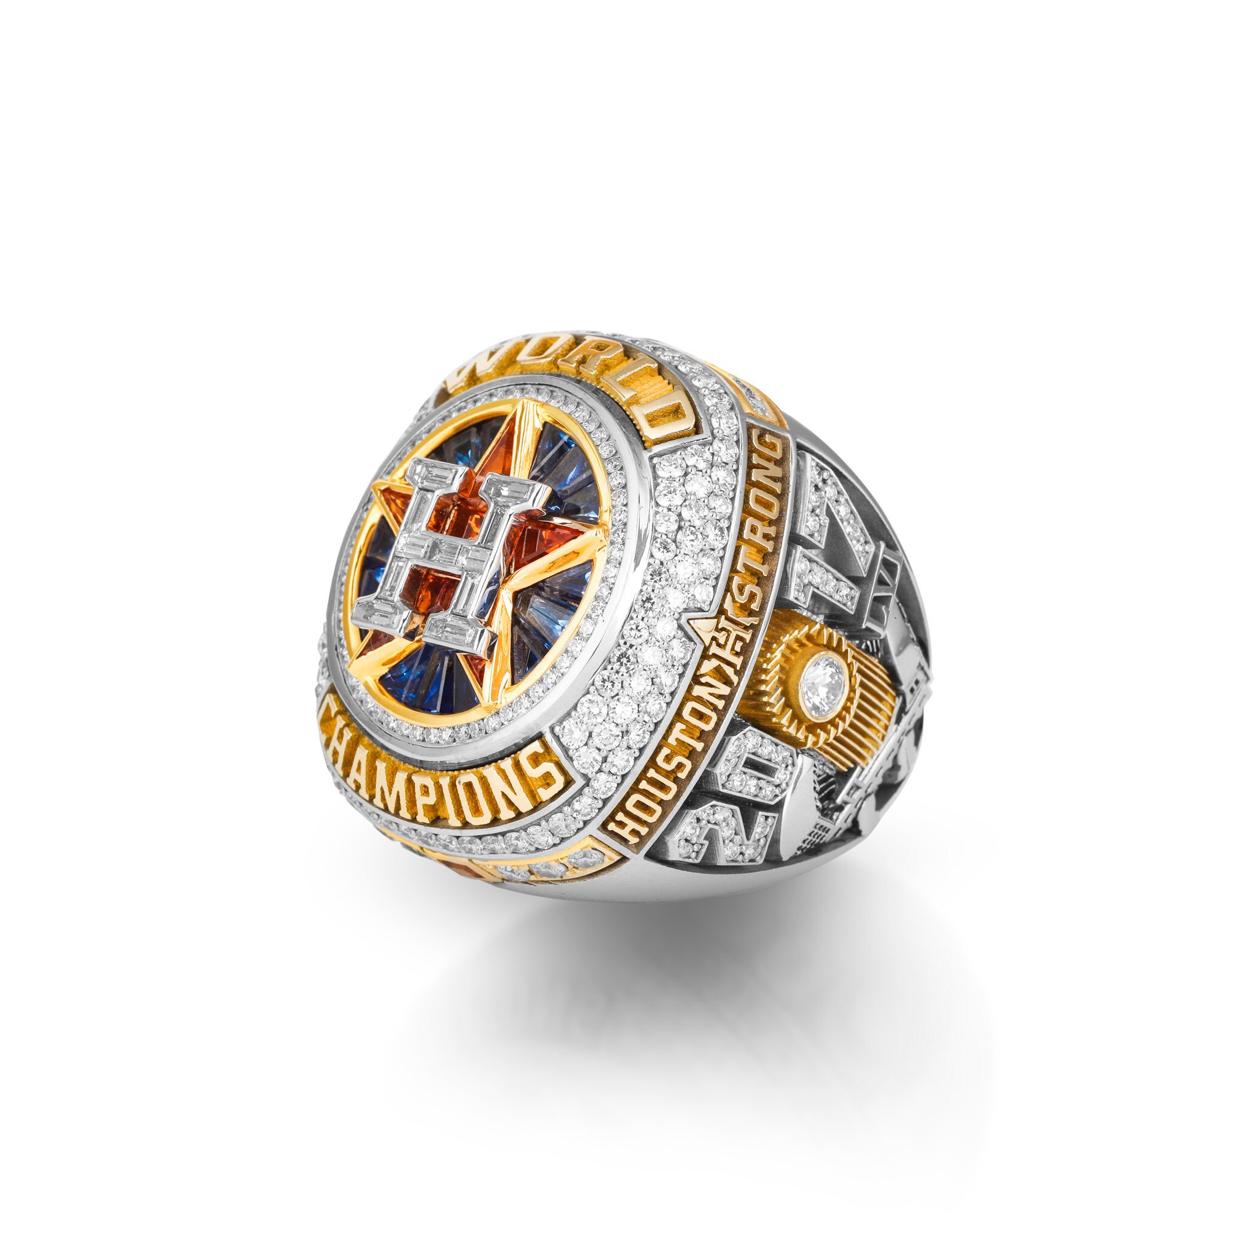 2017 Houston Astros Mlb World Series Champions Ring Championship Rings Astros World Series Nfl Championship Rings